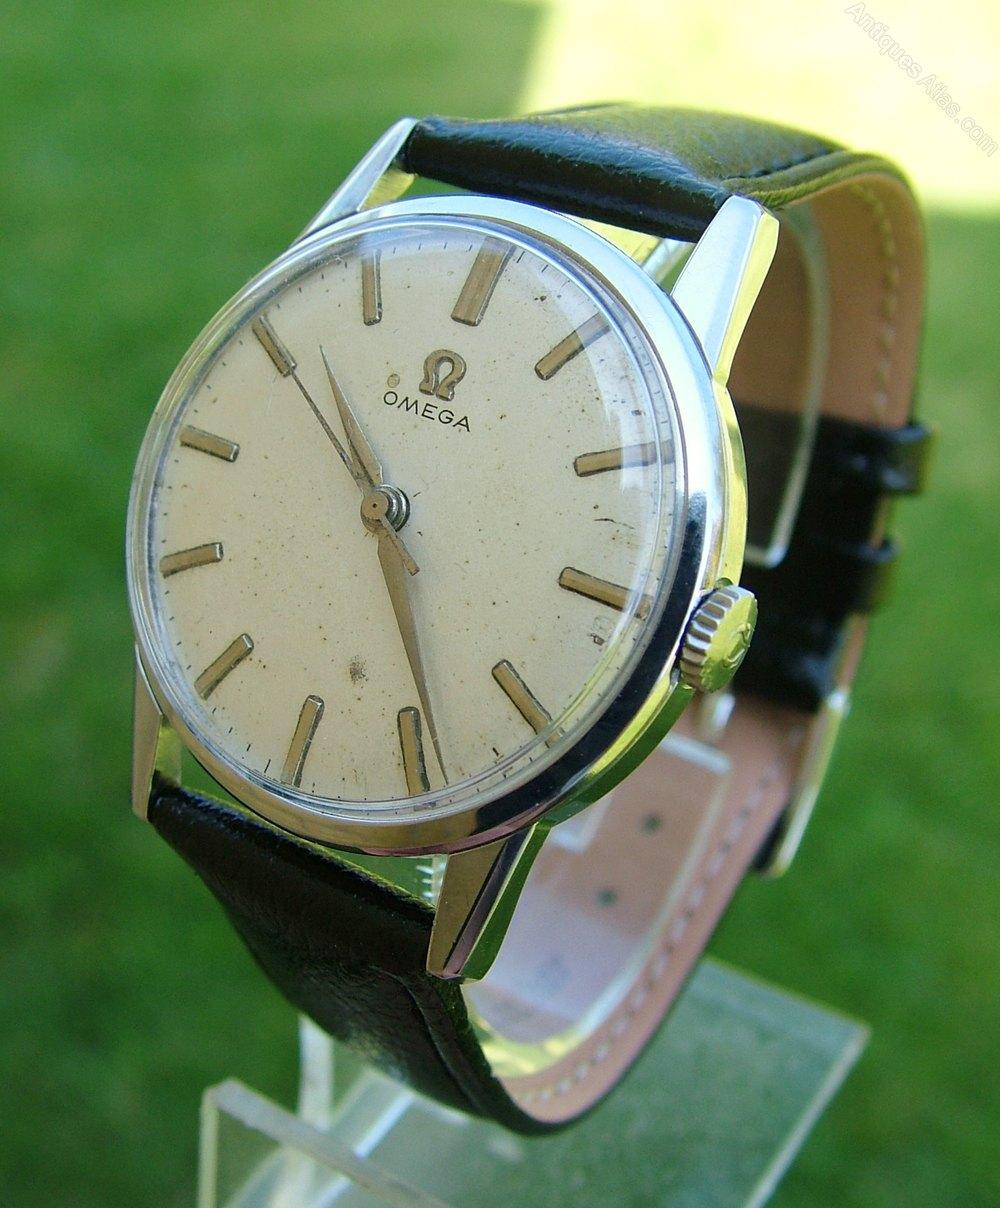 gents wrist watch - photo #34